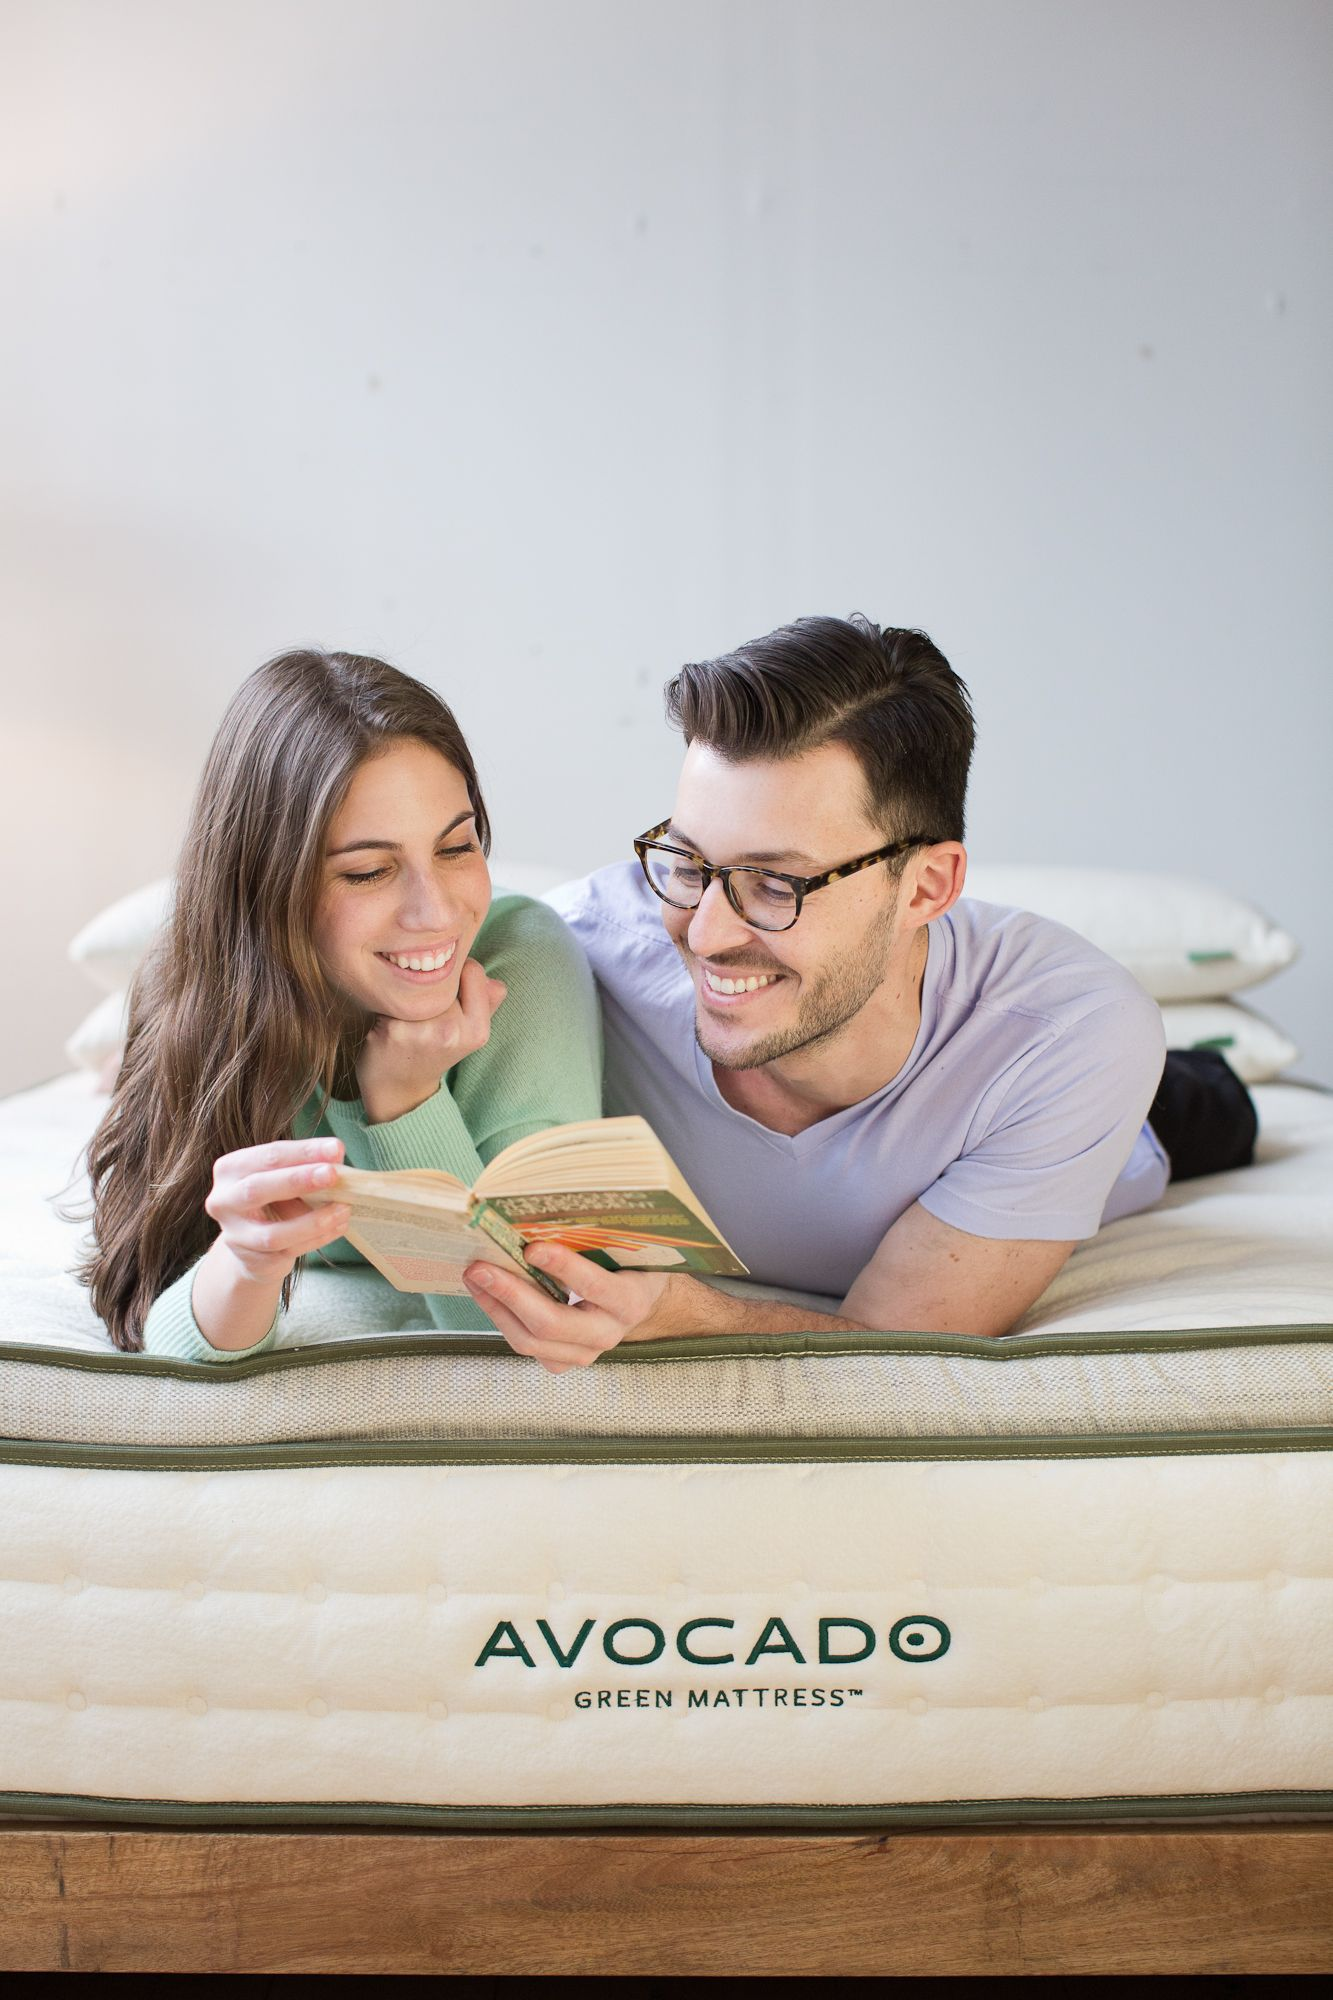 Avocado Green Mattress panosundaki Pin